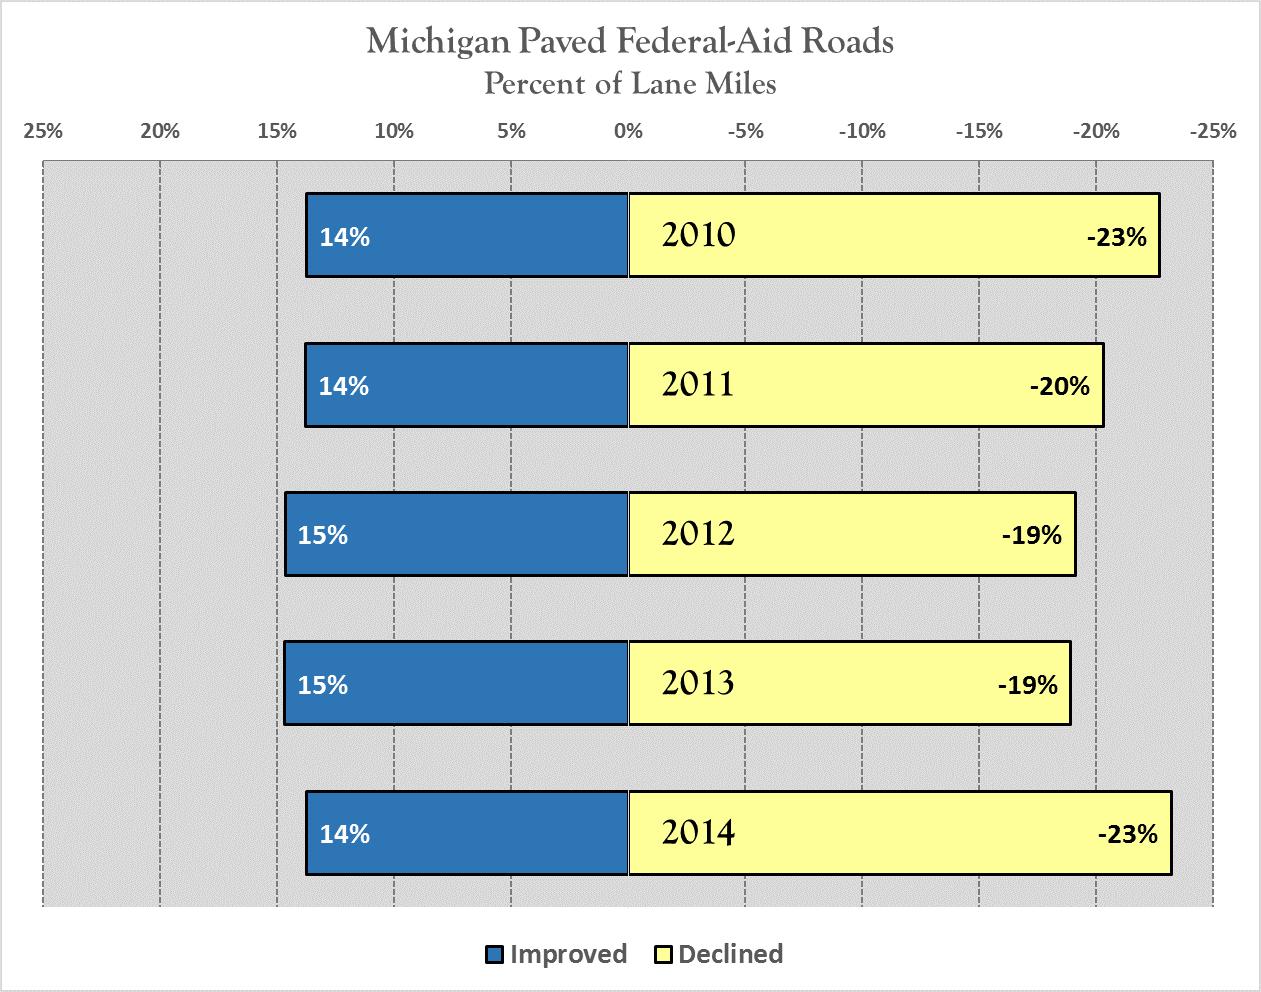 Michigan Paved Federal-Aid Roads